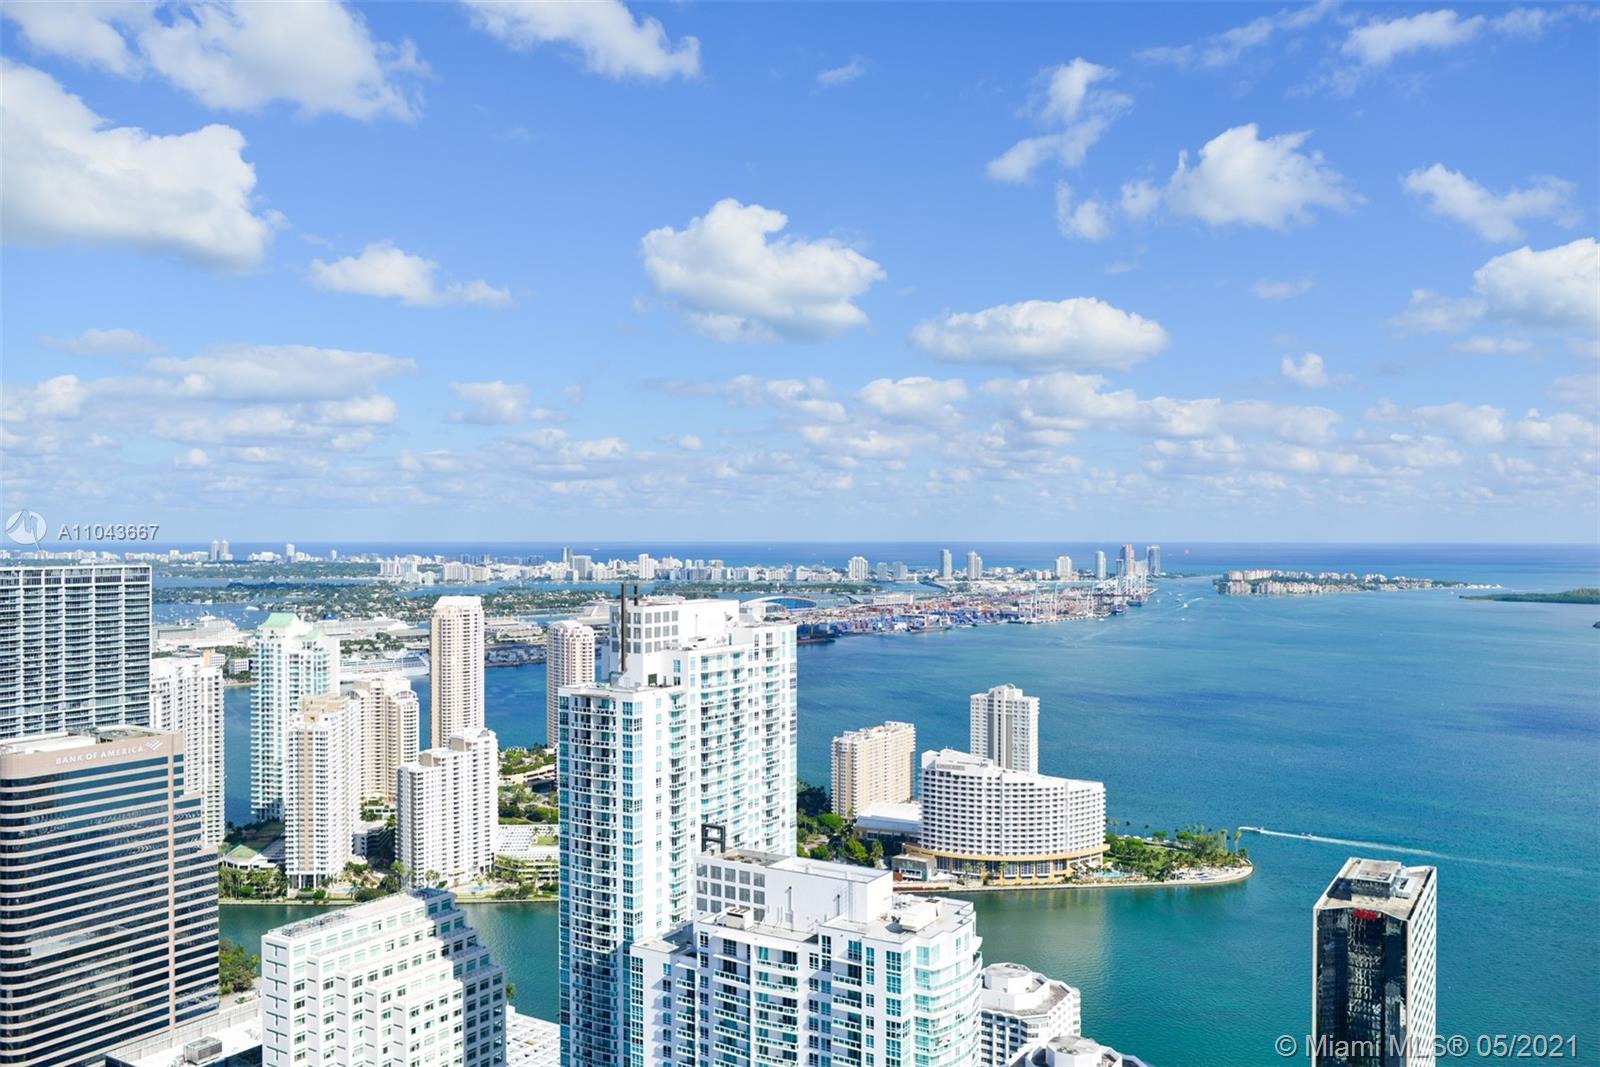 Brickell FlatIron #3302 - 1000 Brickell Plaza #3302, Miami, FL 33131